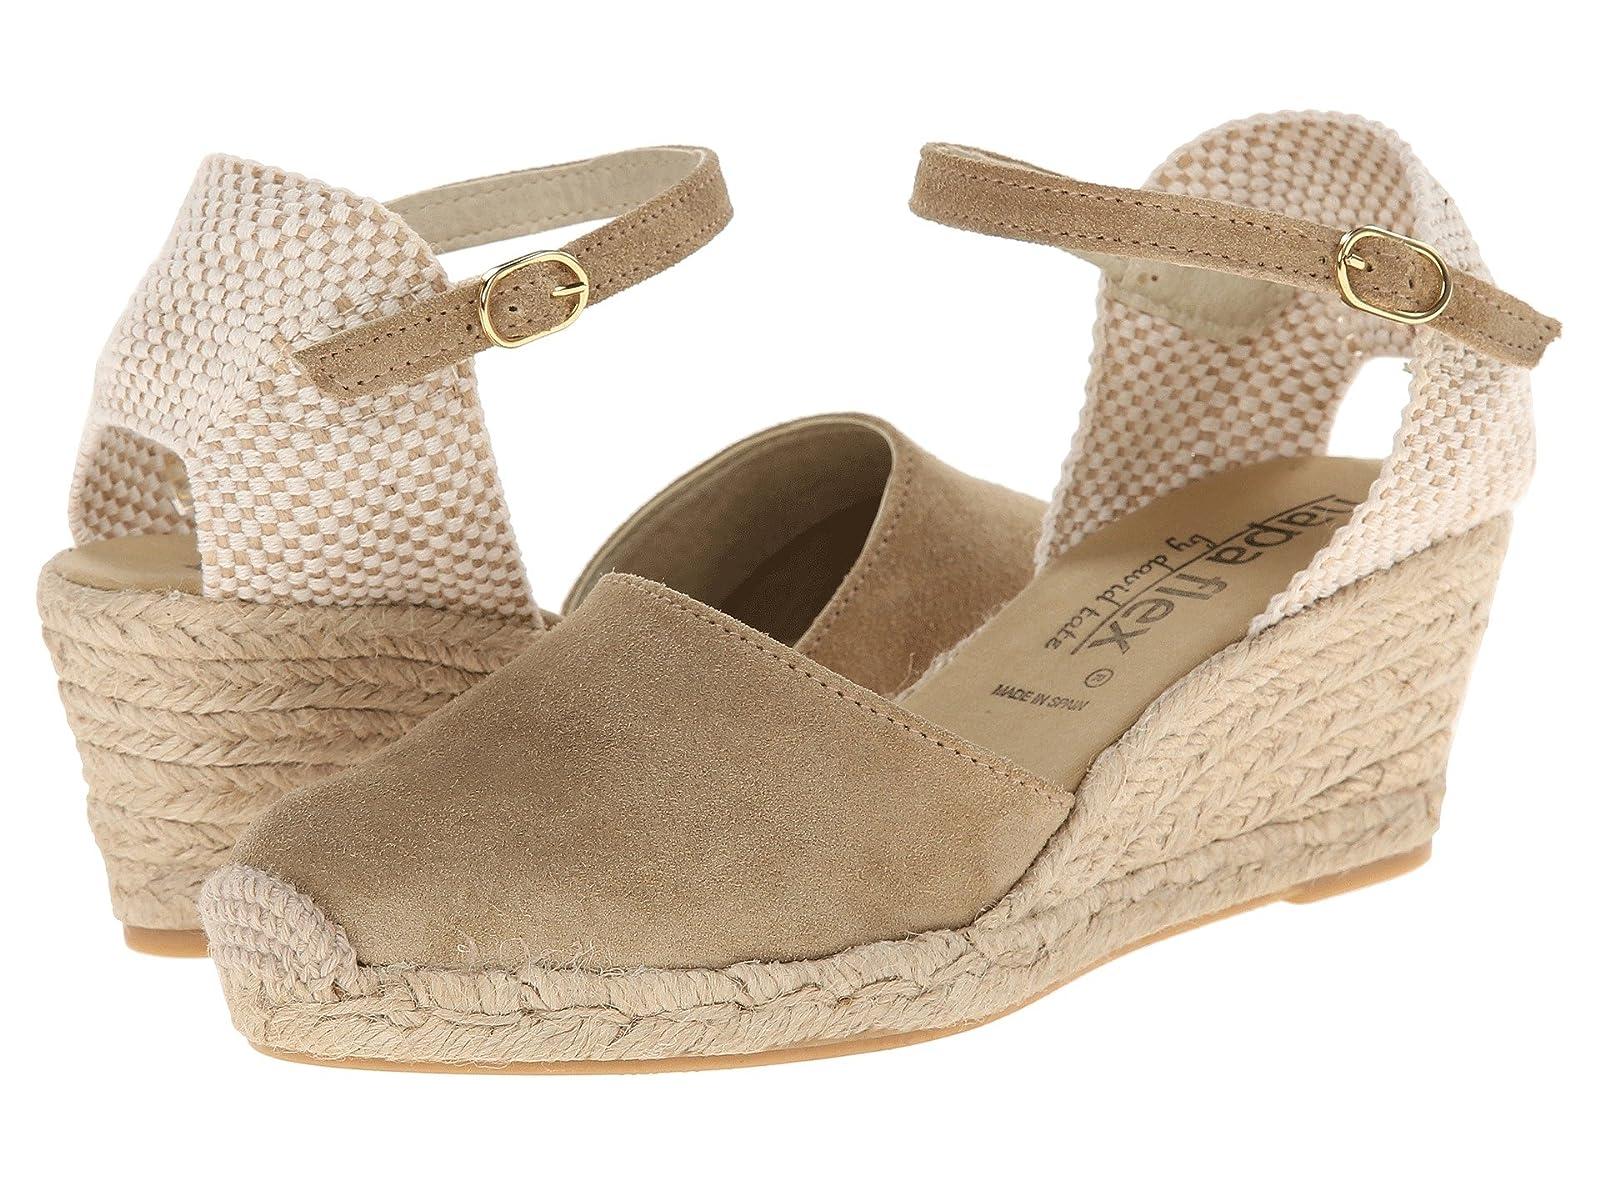 David Tate EuropaCheap and distinctive eye-catching shoes